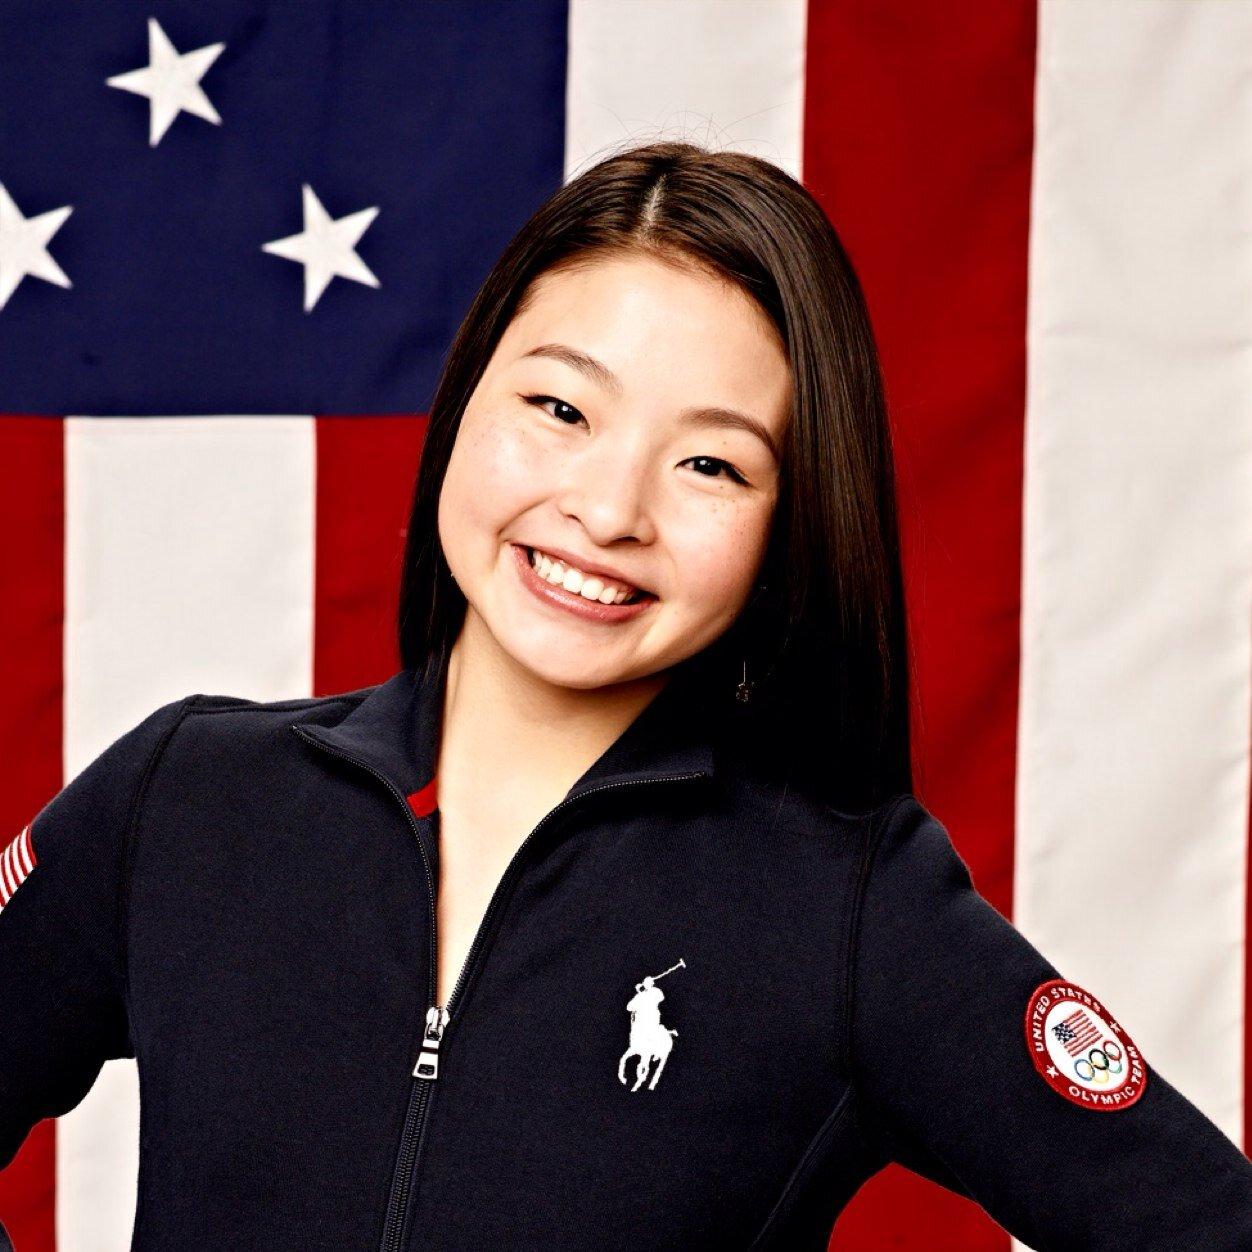 Maia Shibutani, Amerikalı sporcu, buz pateni tarihte bugün